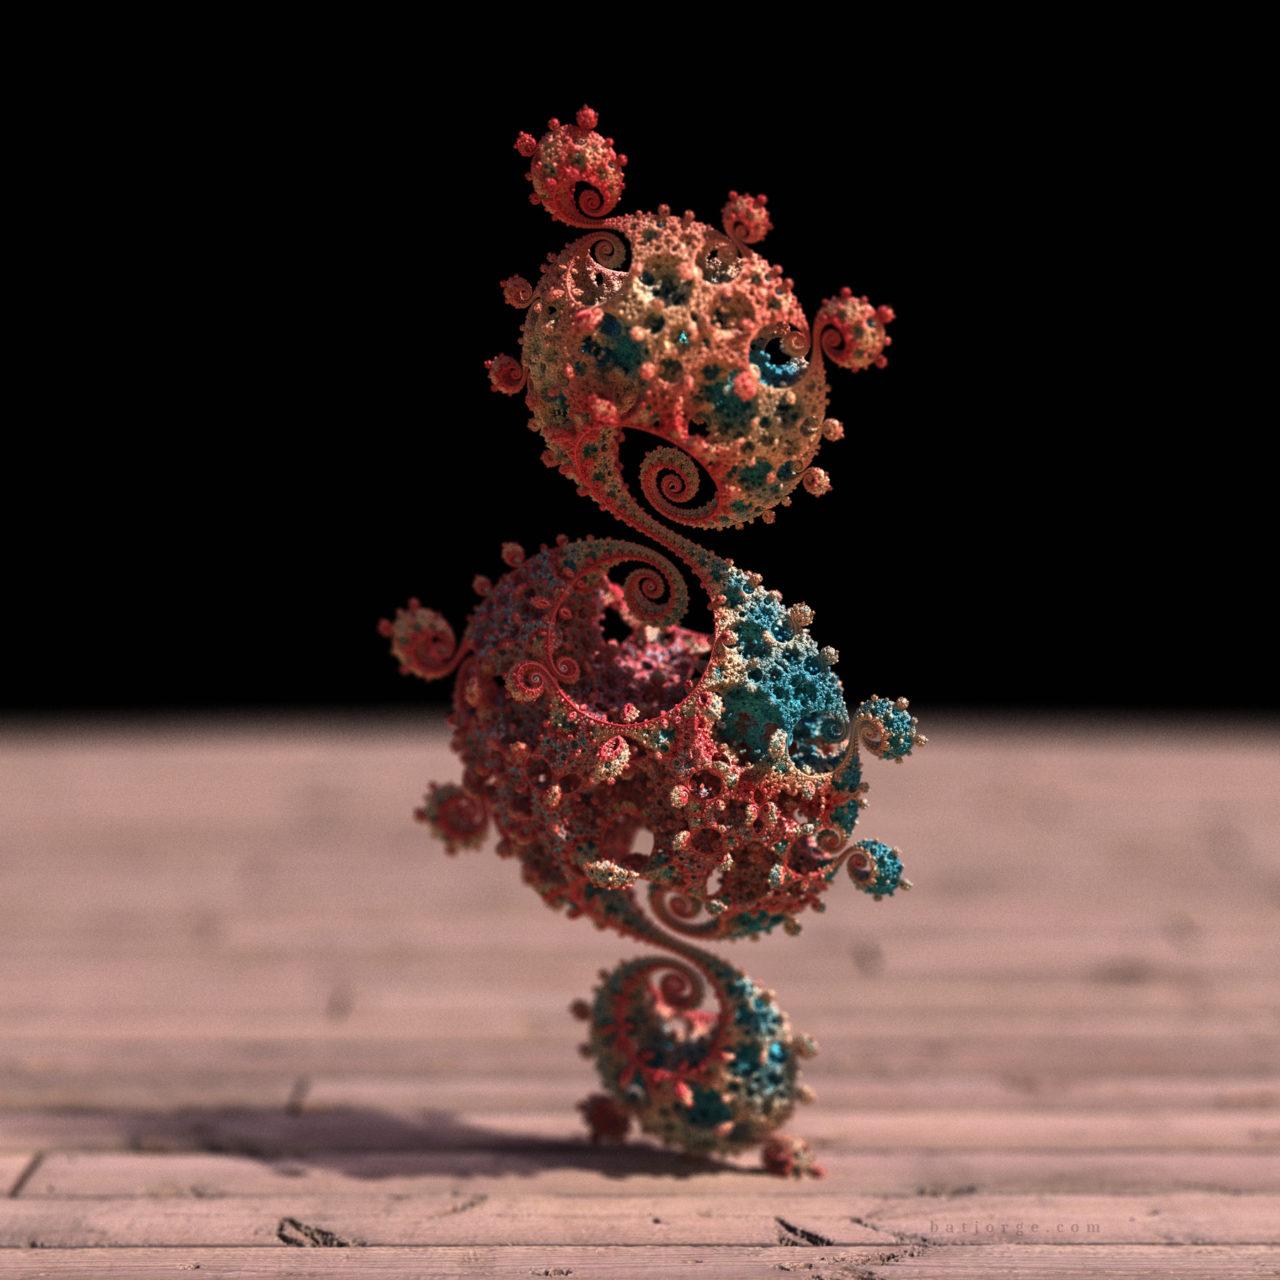 3d fractal. kleinian. mandelbulber